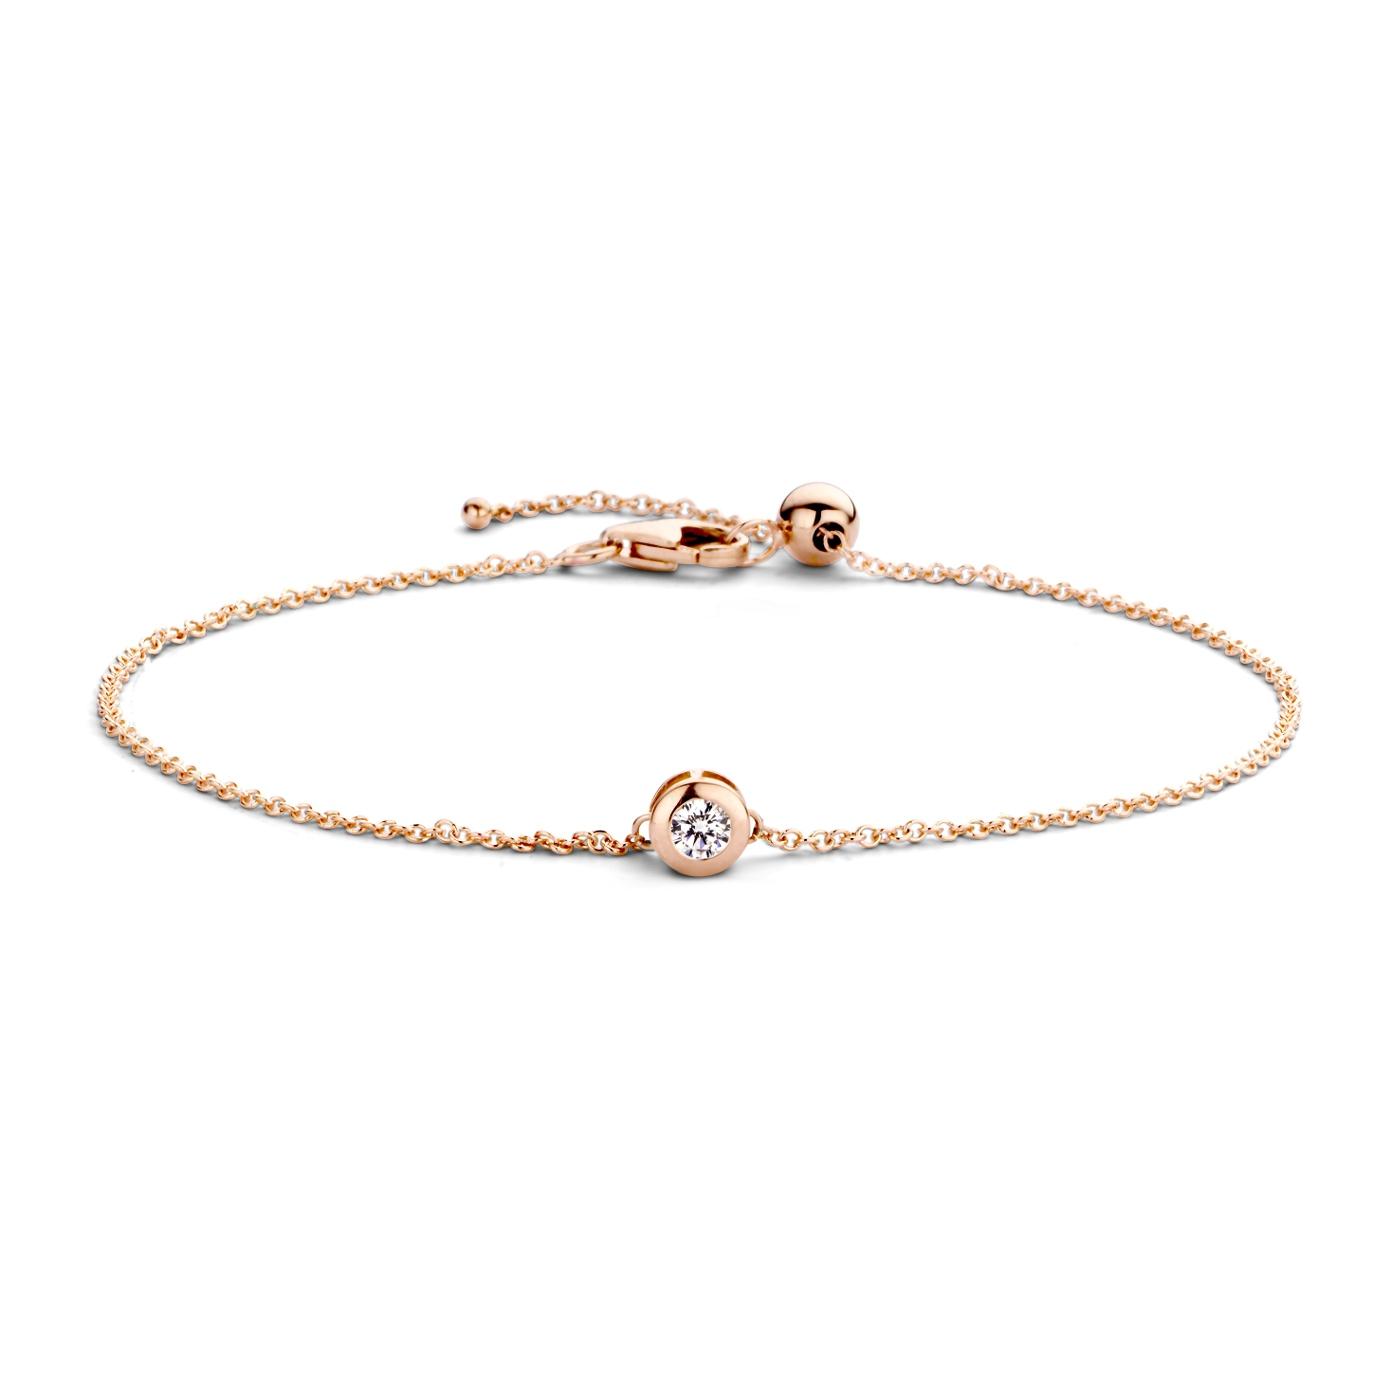 Bilde av Blush bracelet 2167RZI (Size: 18 cm)